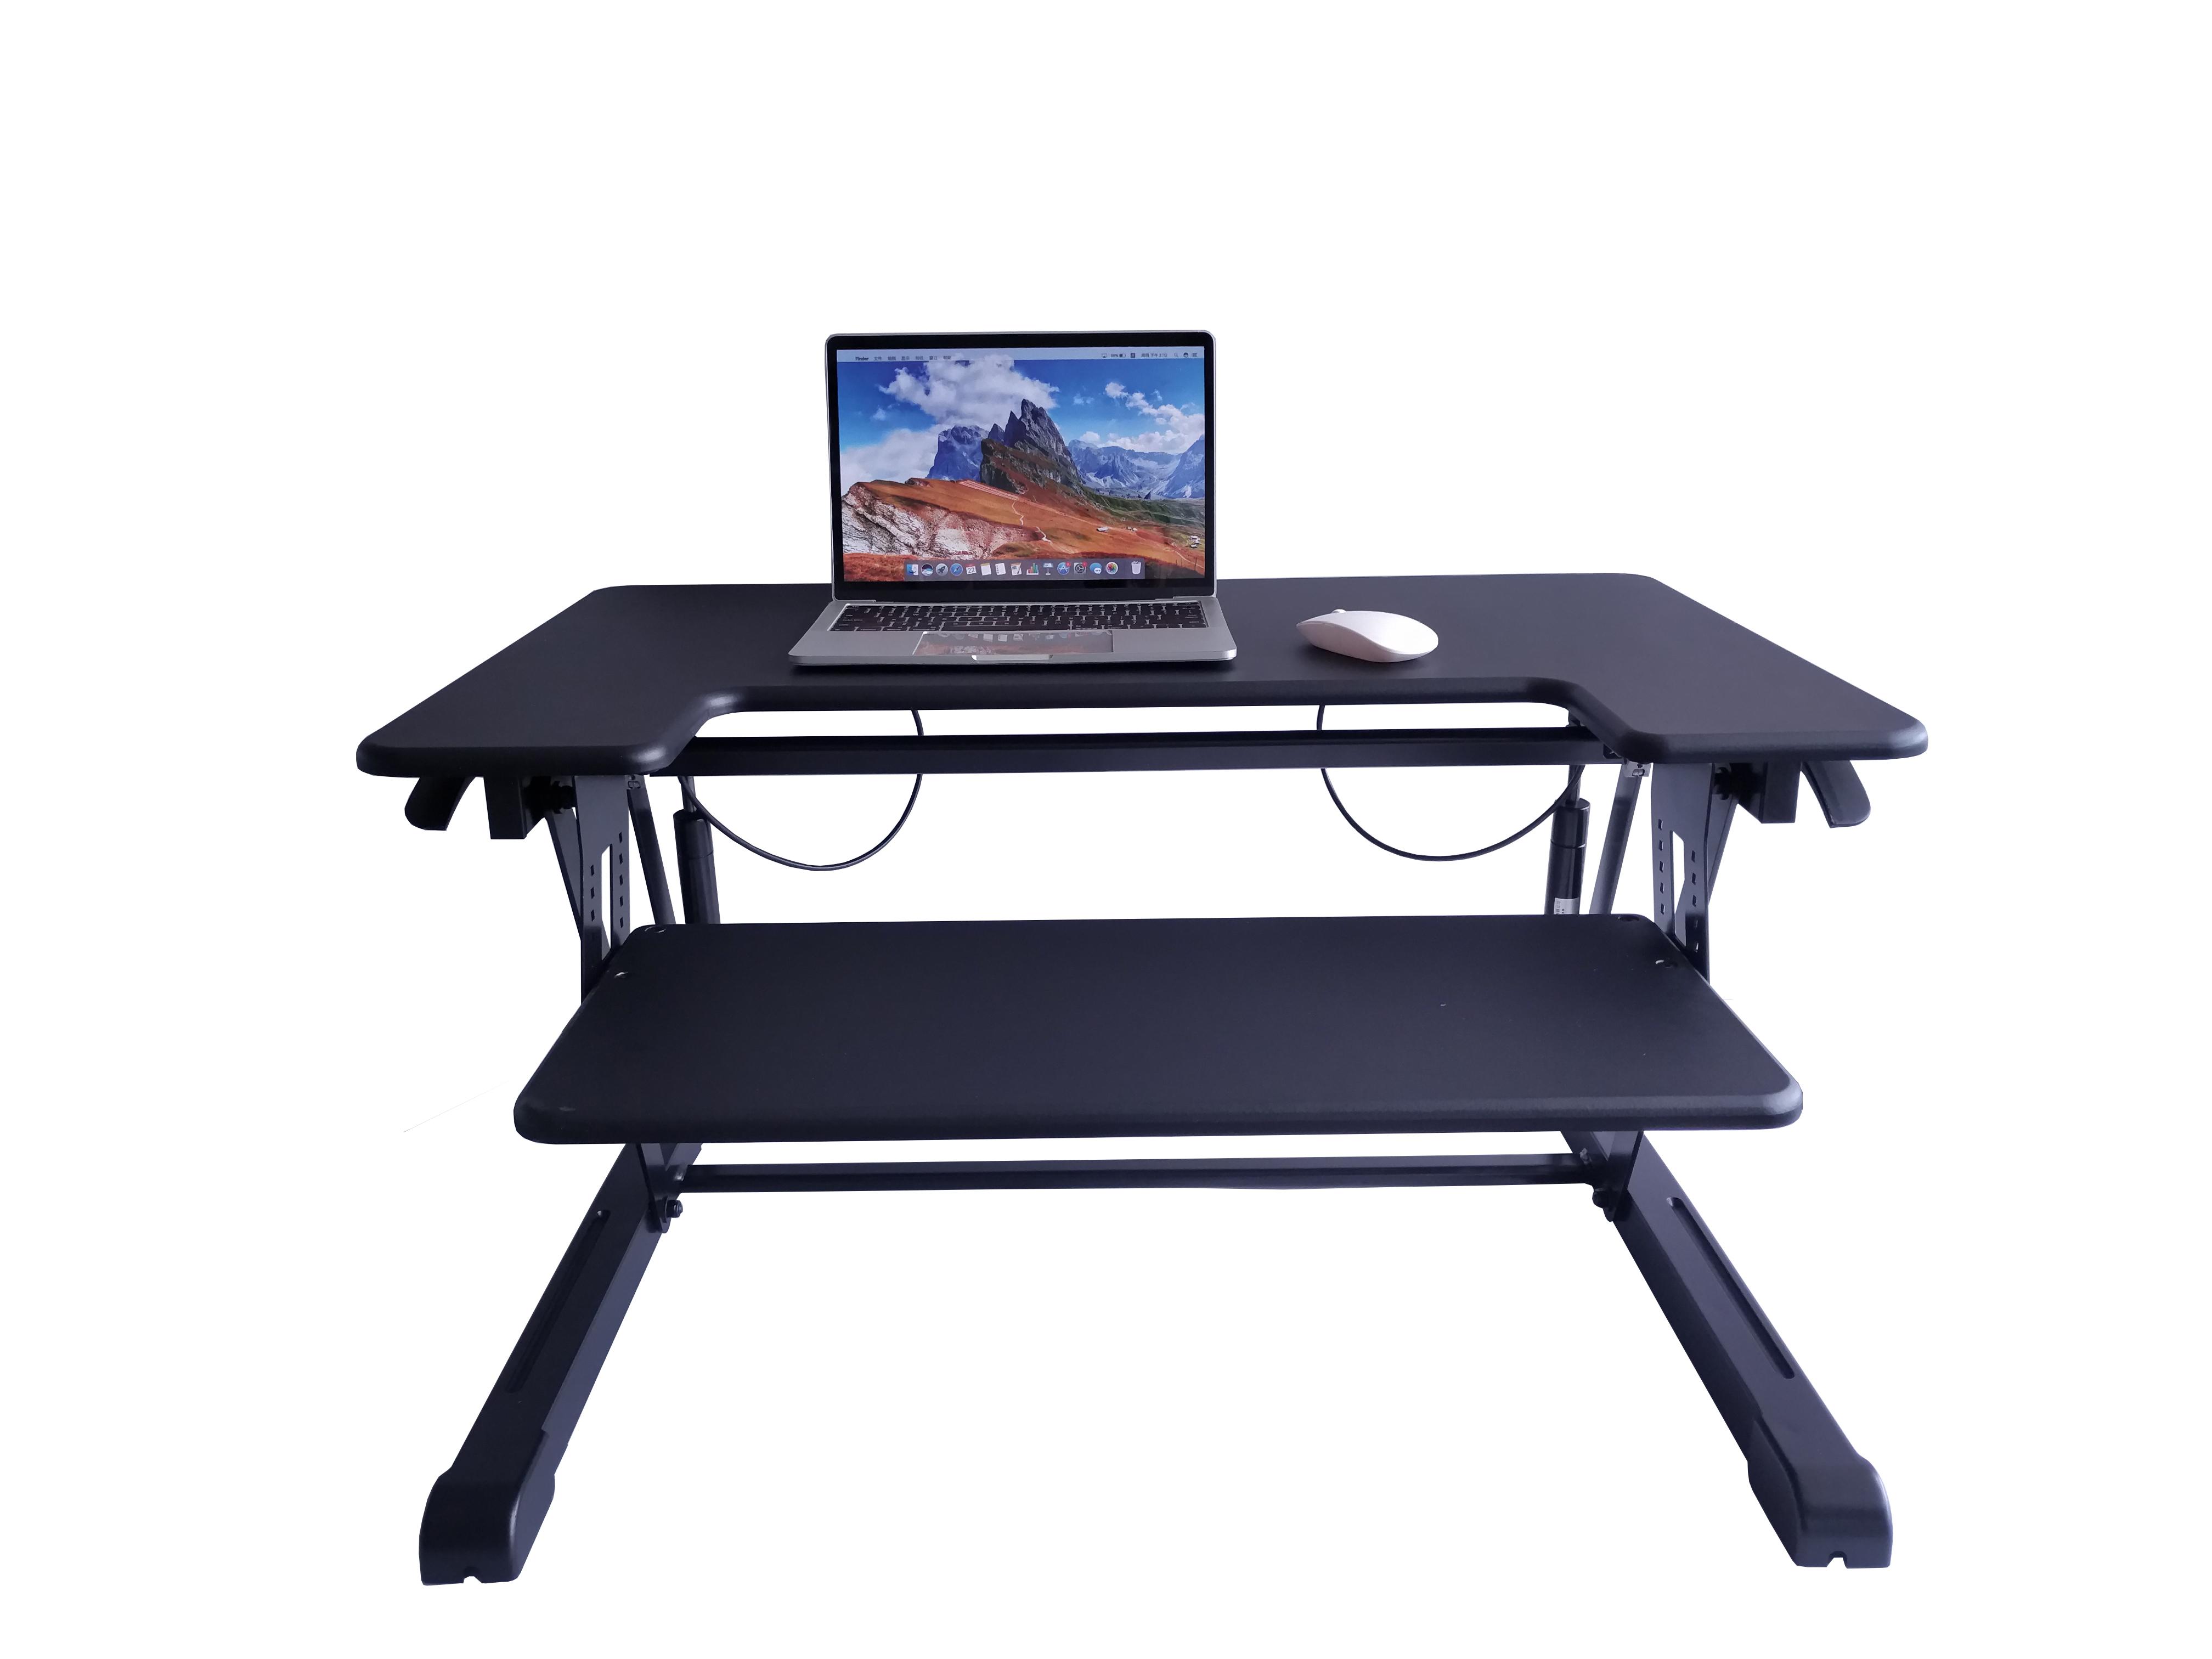 Standing Desk, Height Adjustable Stand Up Desk Gas Spring Riser Converter Sit to Stand Desk